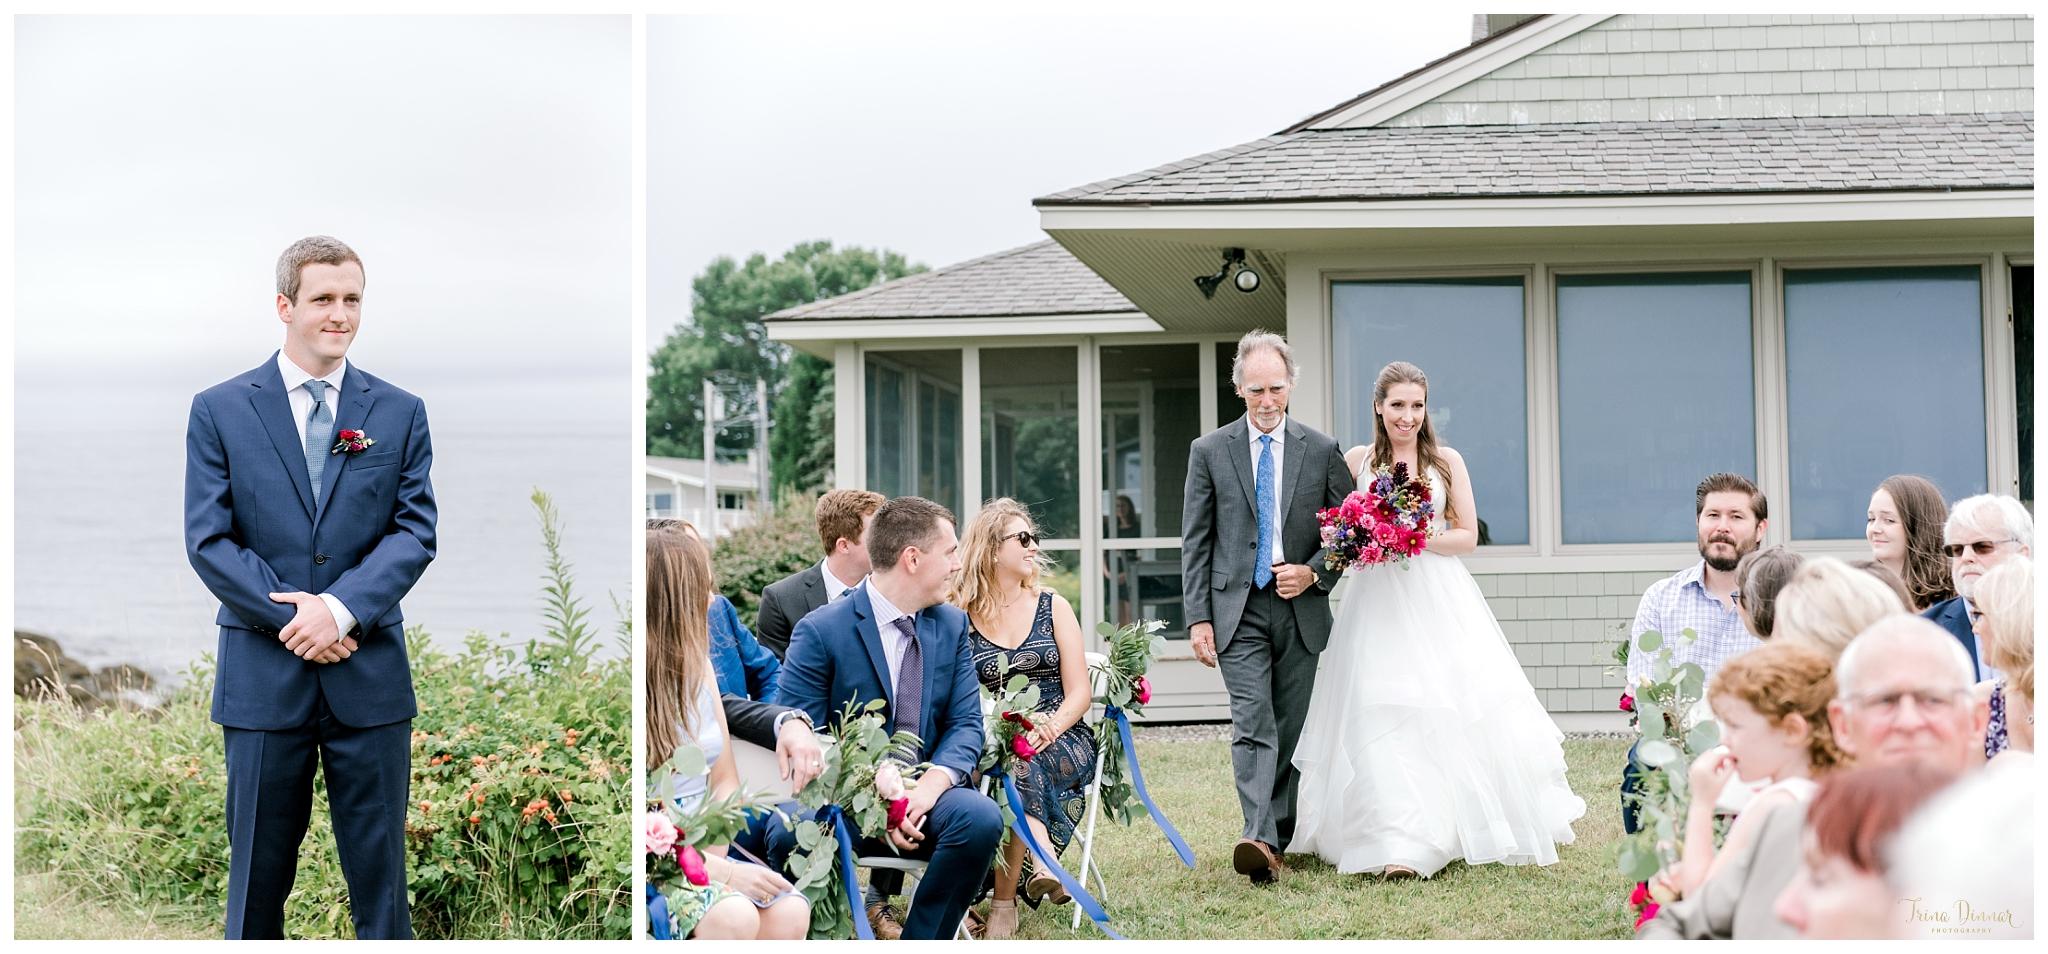 Michael sees Hannah on Wedding Day